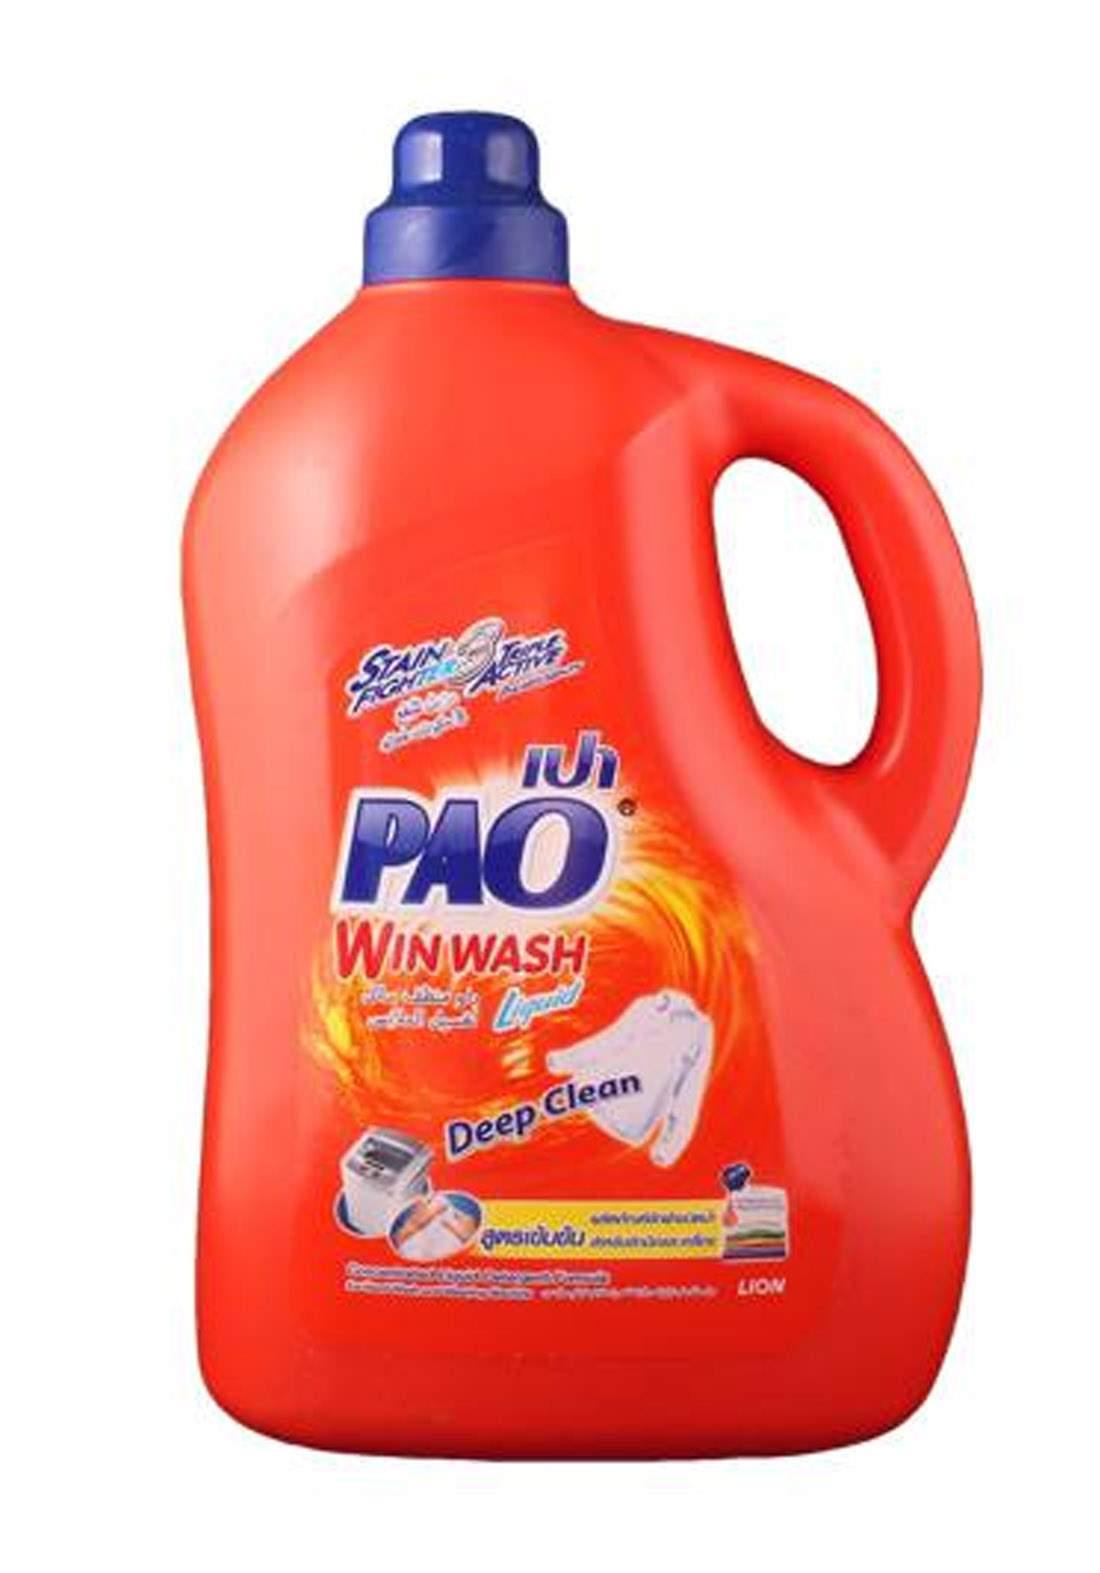 Iuh Pao Liquid Detergent Win Wash Triple Active Stain Fighter 3 L سائل غسيل الملابس بفعالية ثلاثية لأزالة البقع